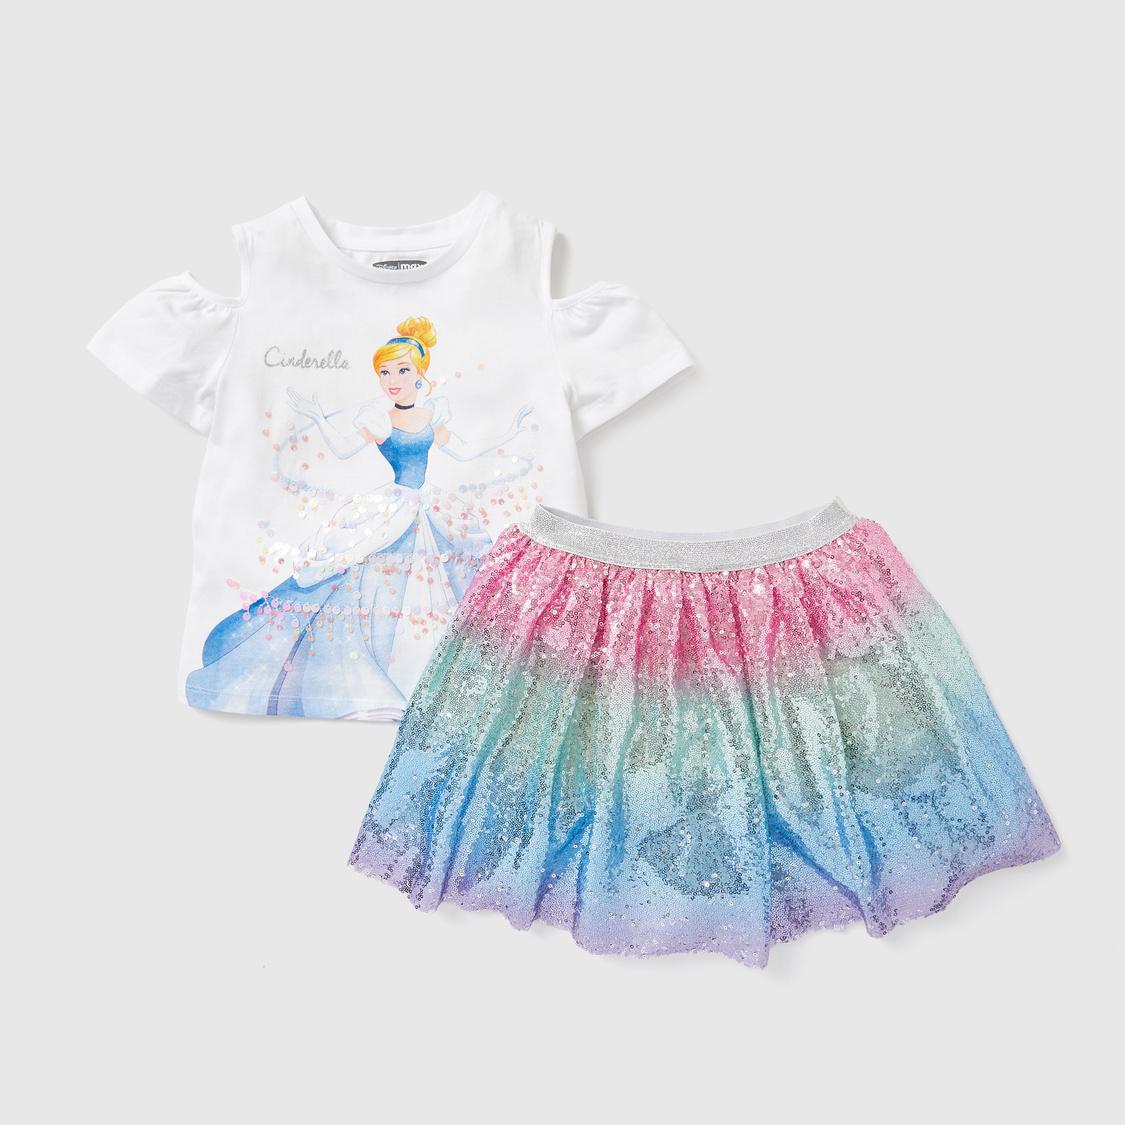 Cinderella Graphic Print Round Neck T-shirt with Sequin Detail Skirt